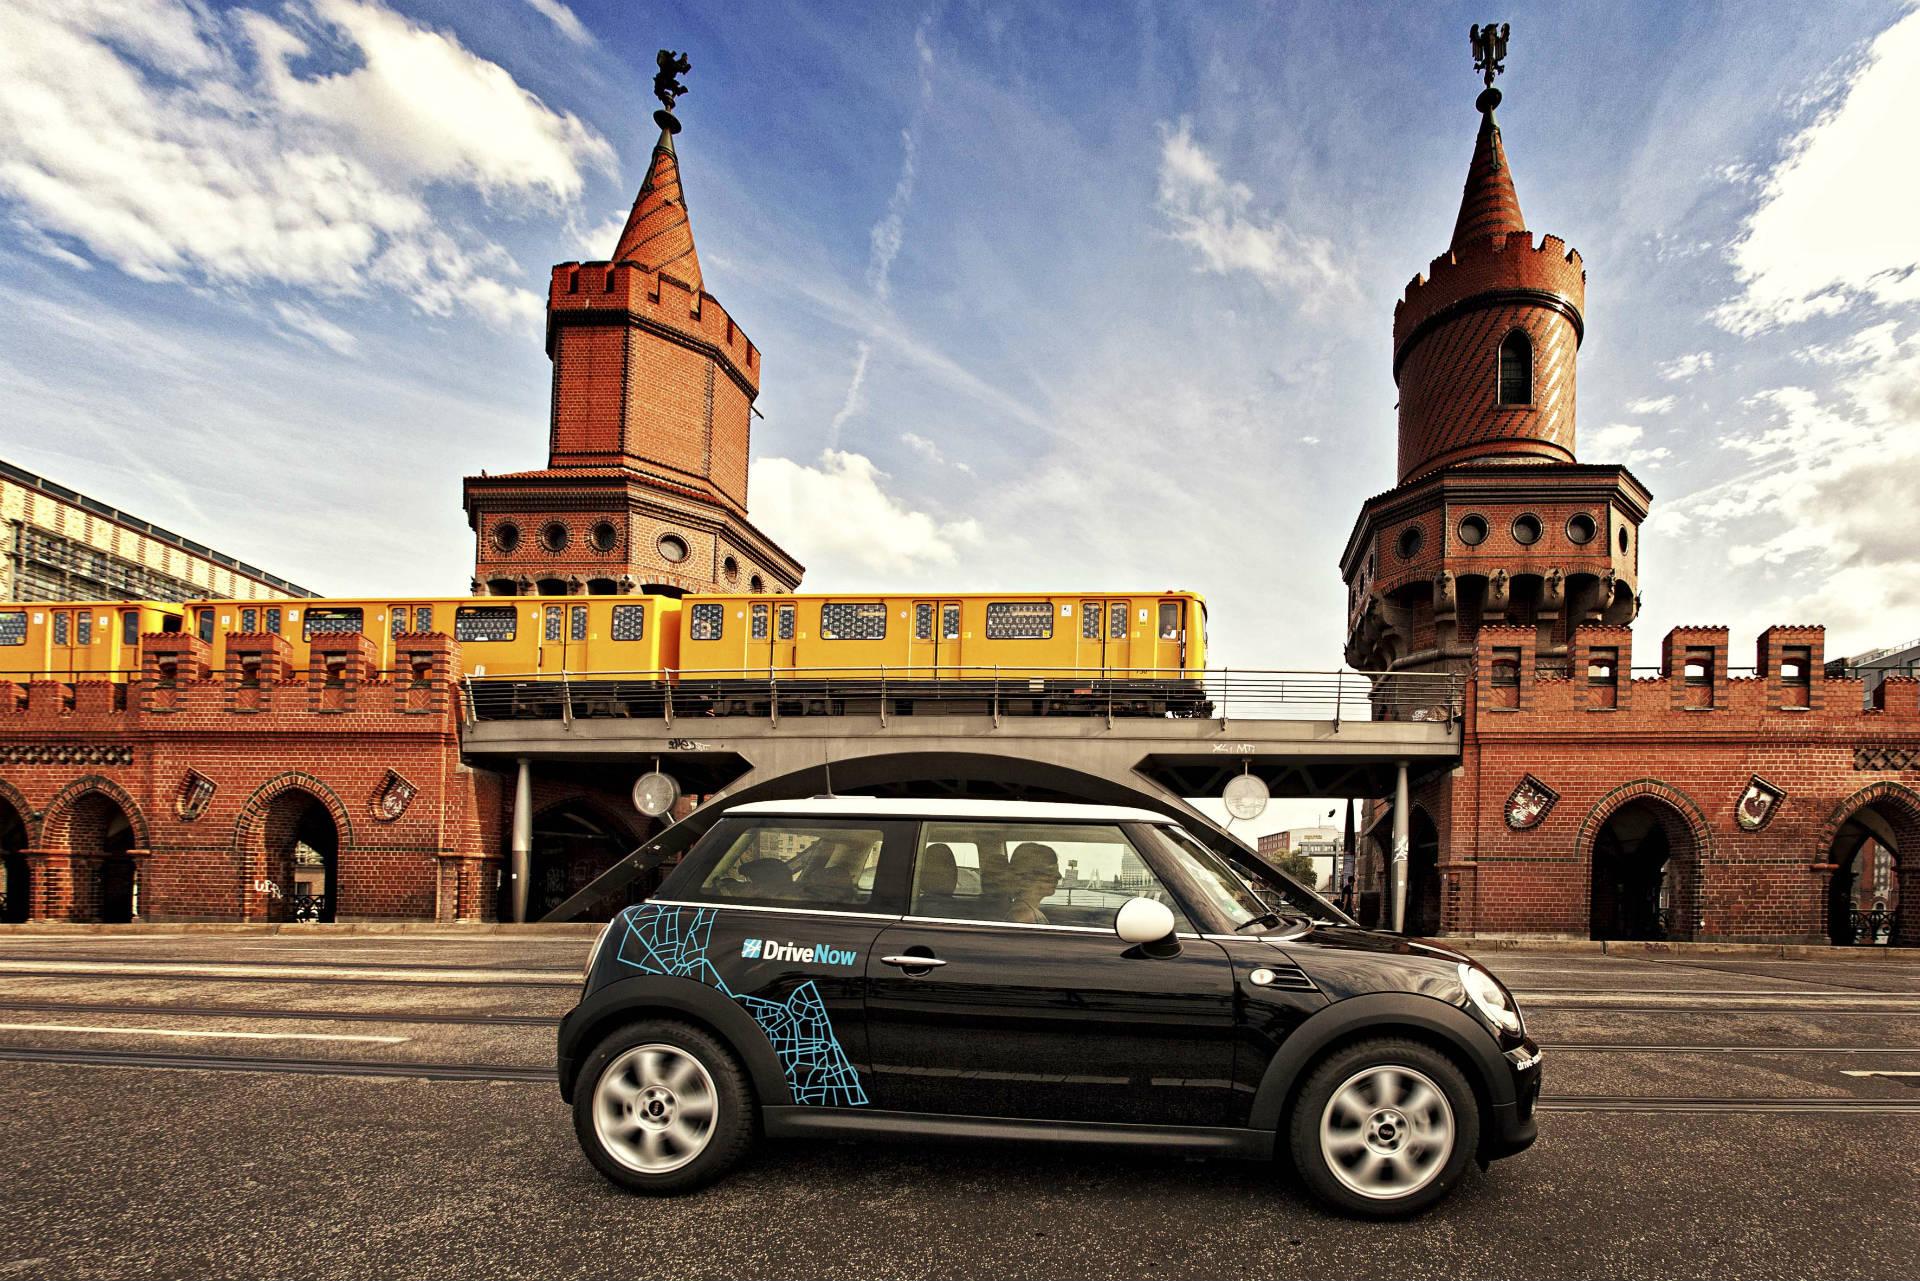 DriveNow MINI vor der Oberbaumbrücke in Berlin